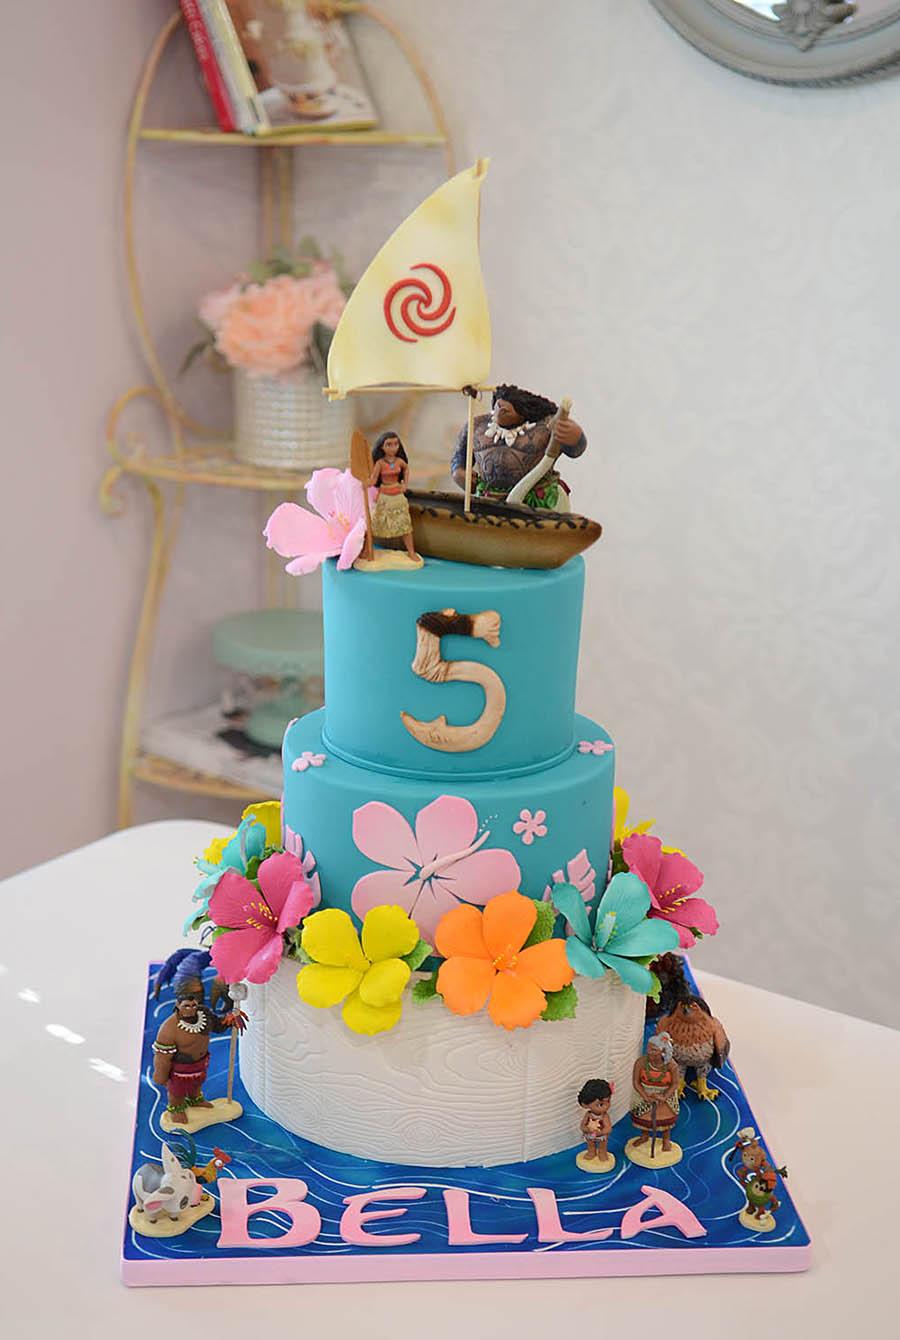 Enjoyable Miamis Best Birthday Cakes Elegant Temptations Bakery Funny Birthday Cards Online Hendilapandamsfinfo